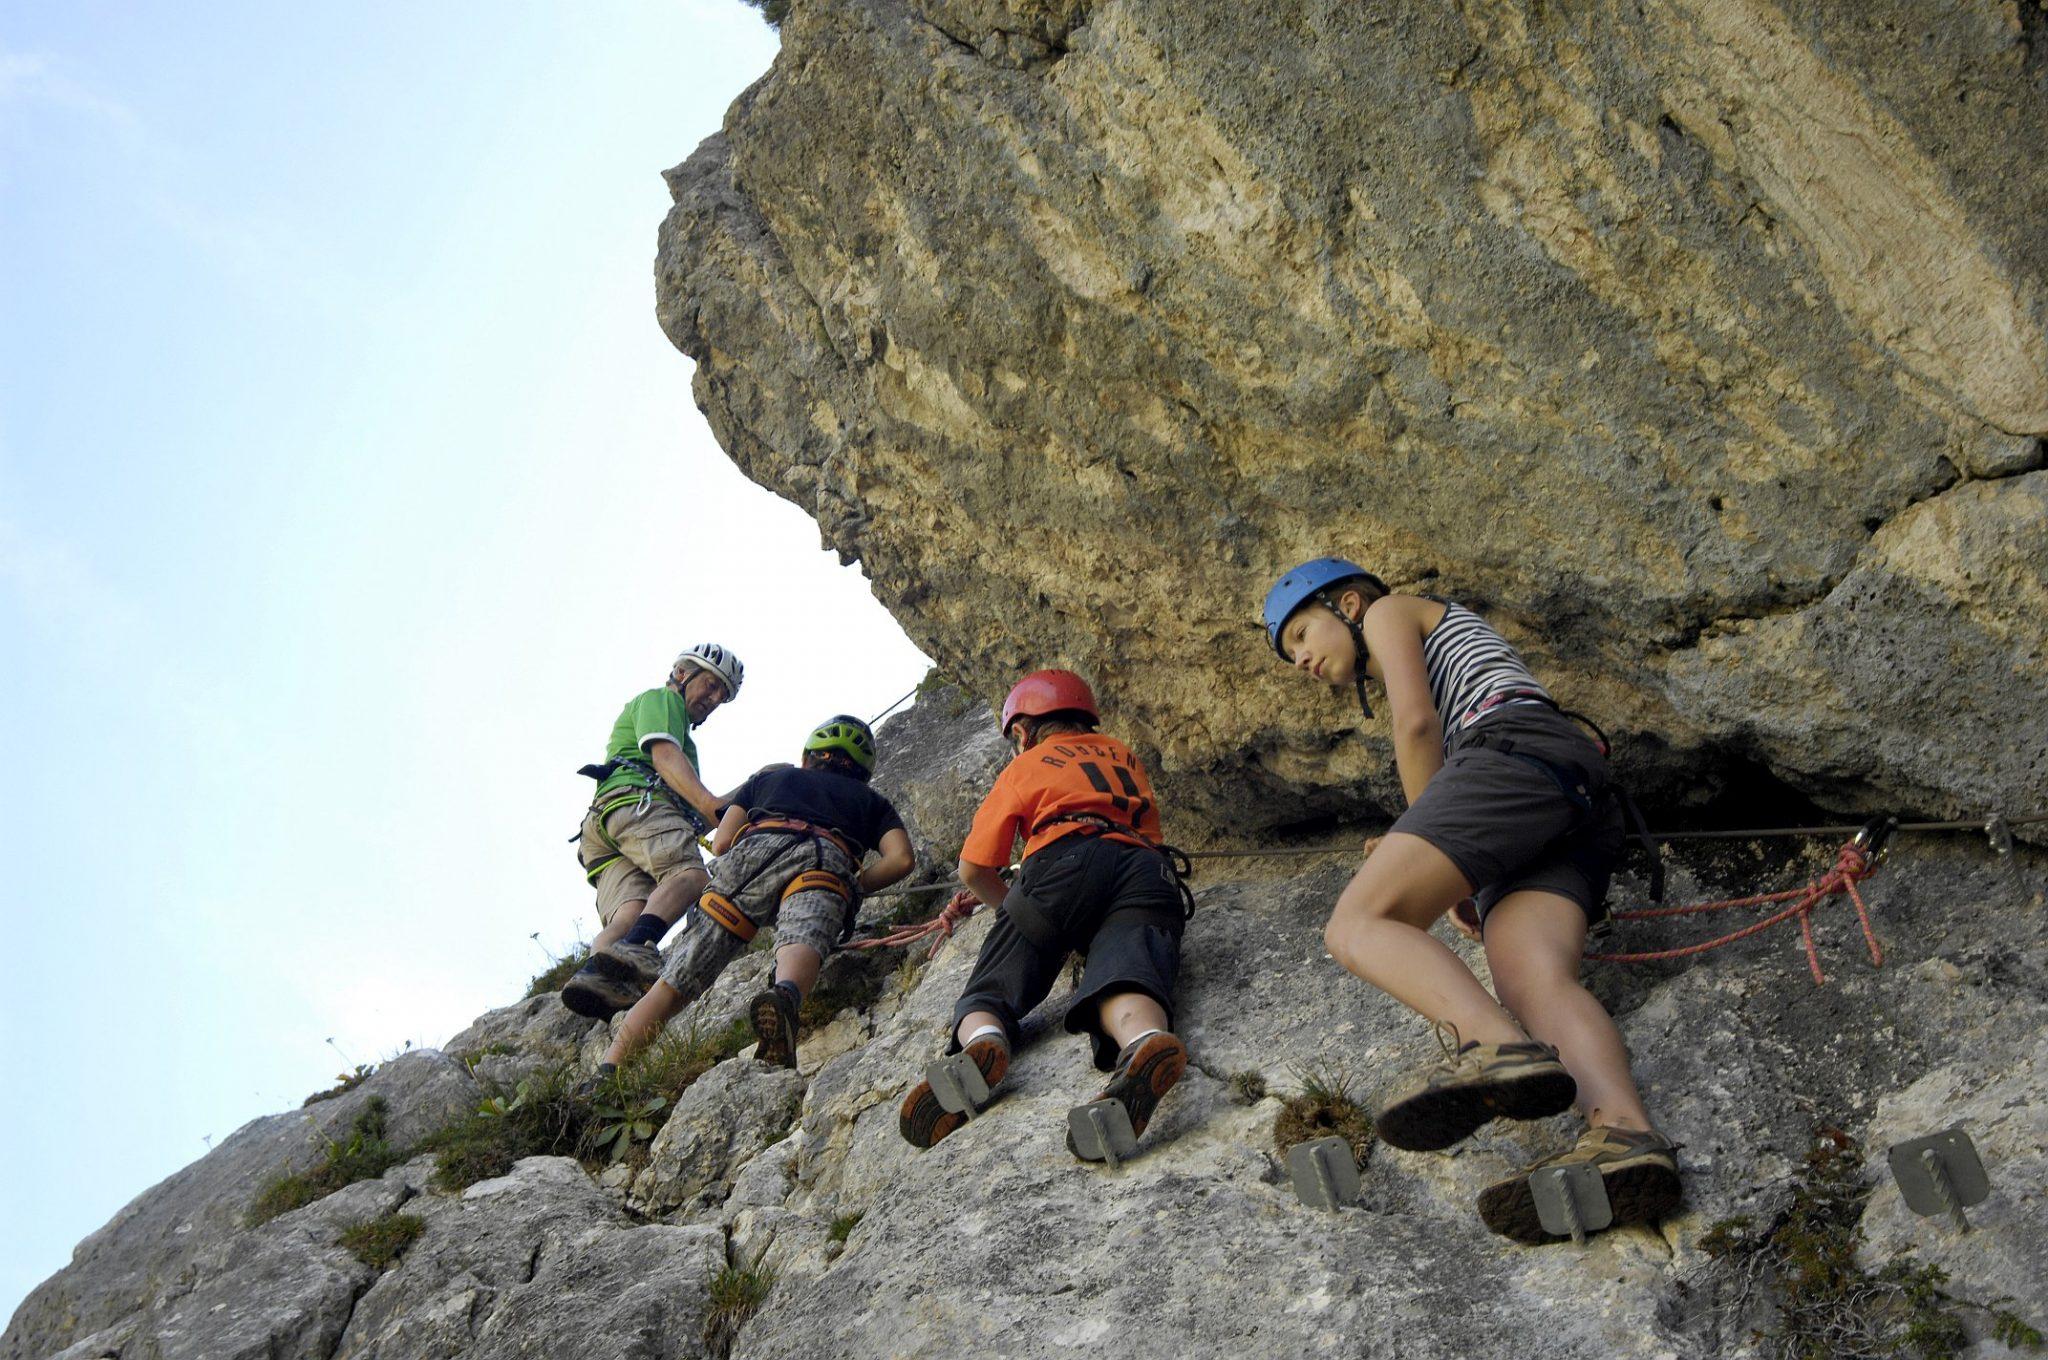 Klettersteig im Rofan, Foto: Sepp Rettenbacher | Climbers Paradise